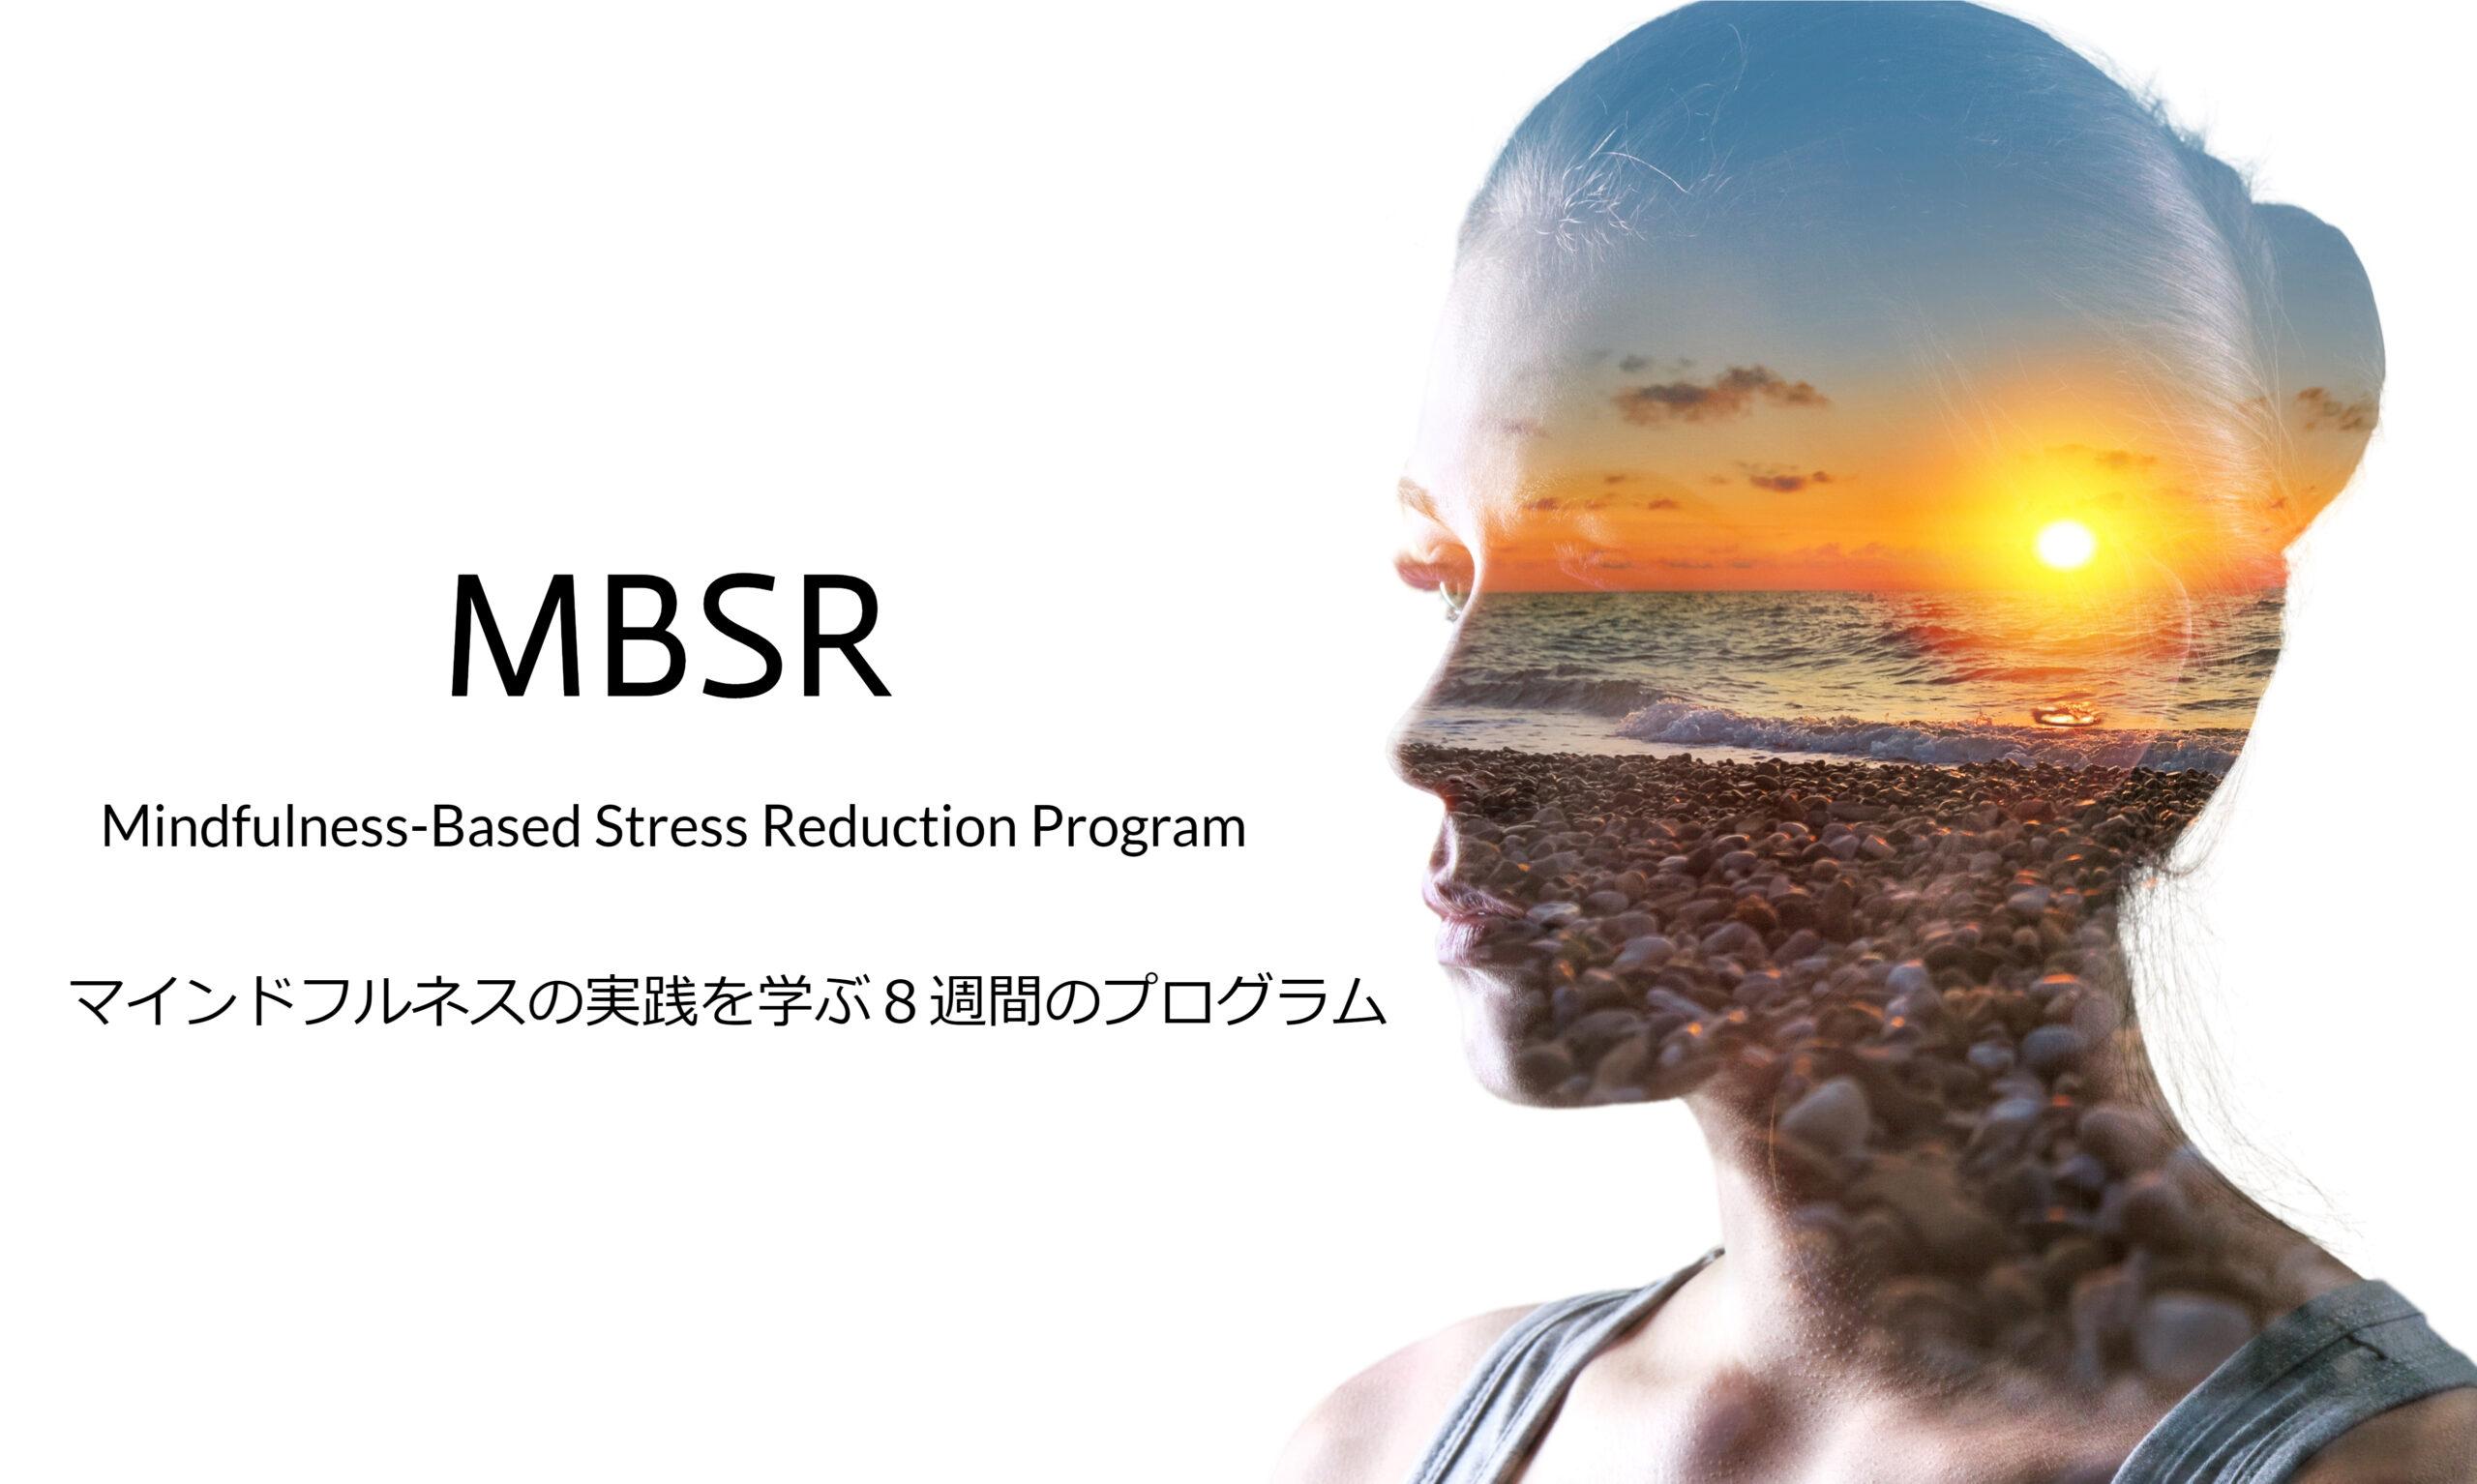 MBSR 8-week program